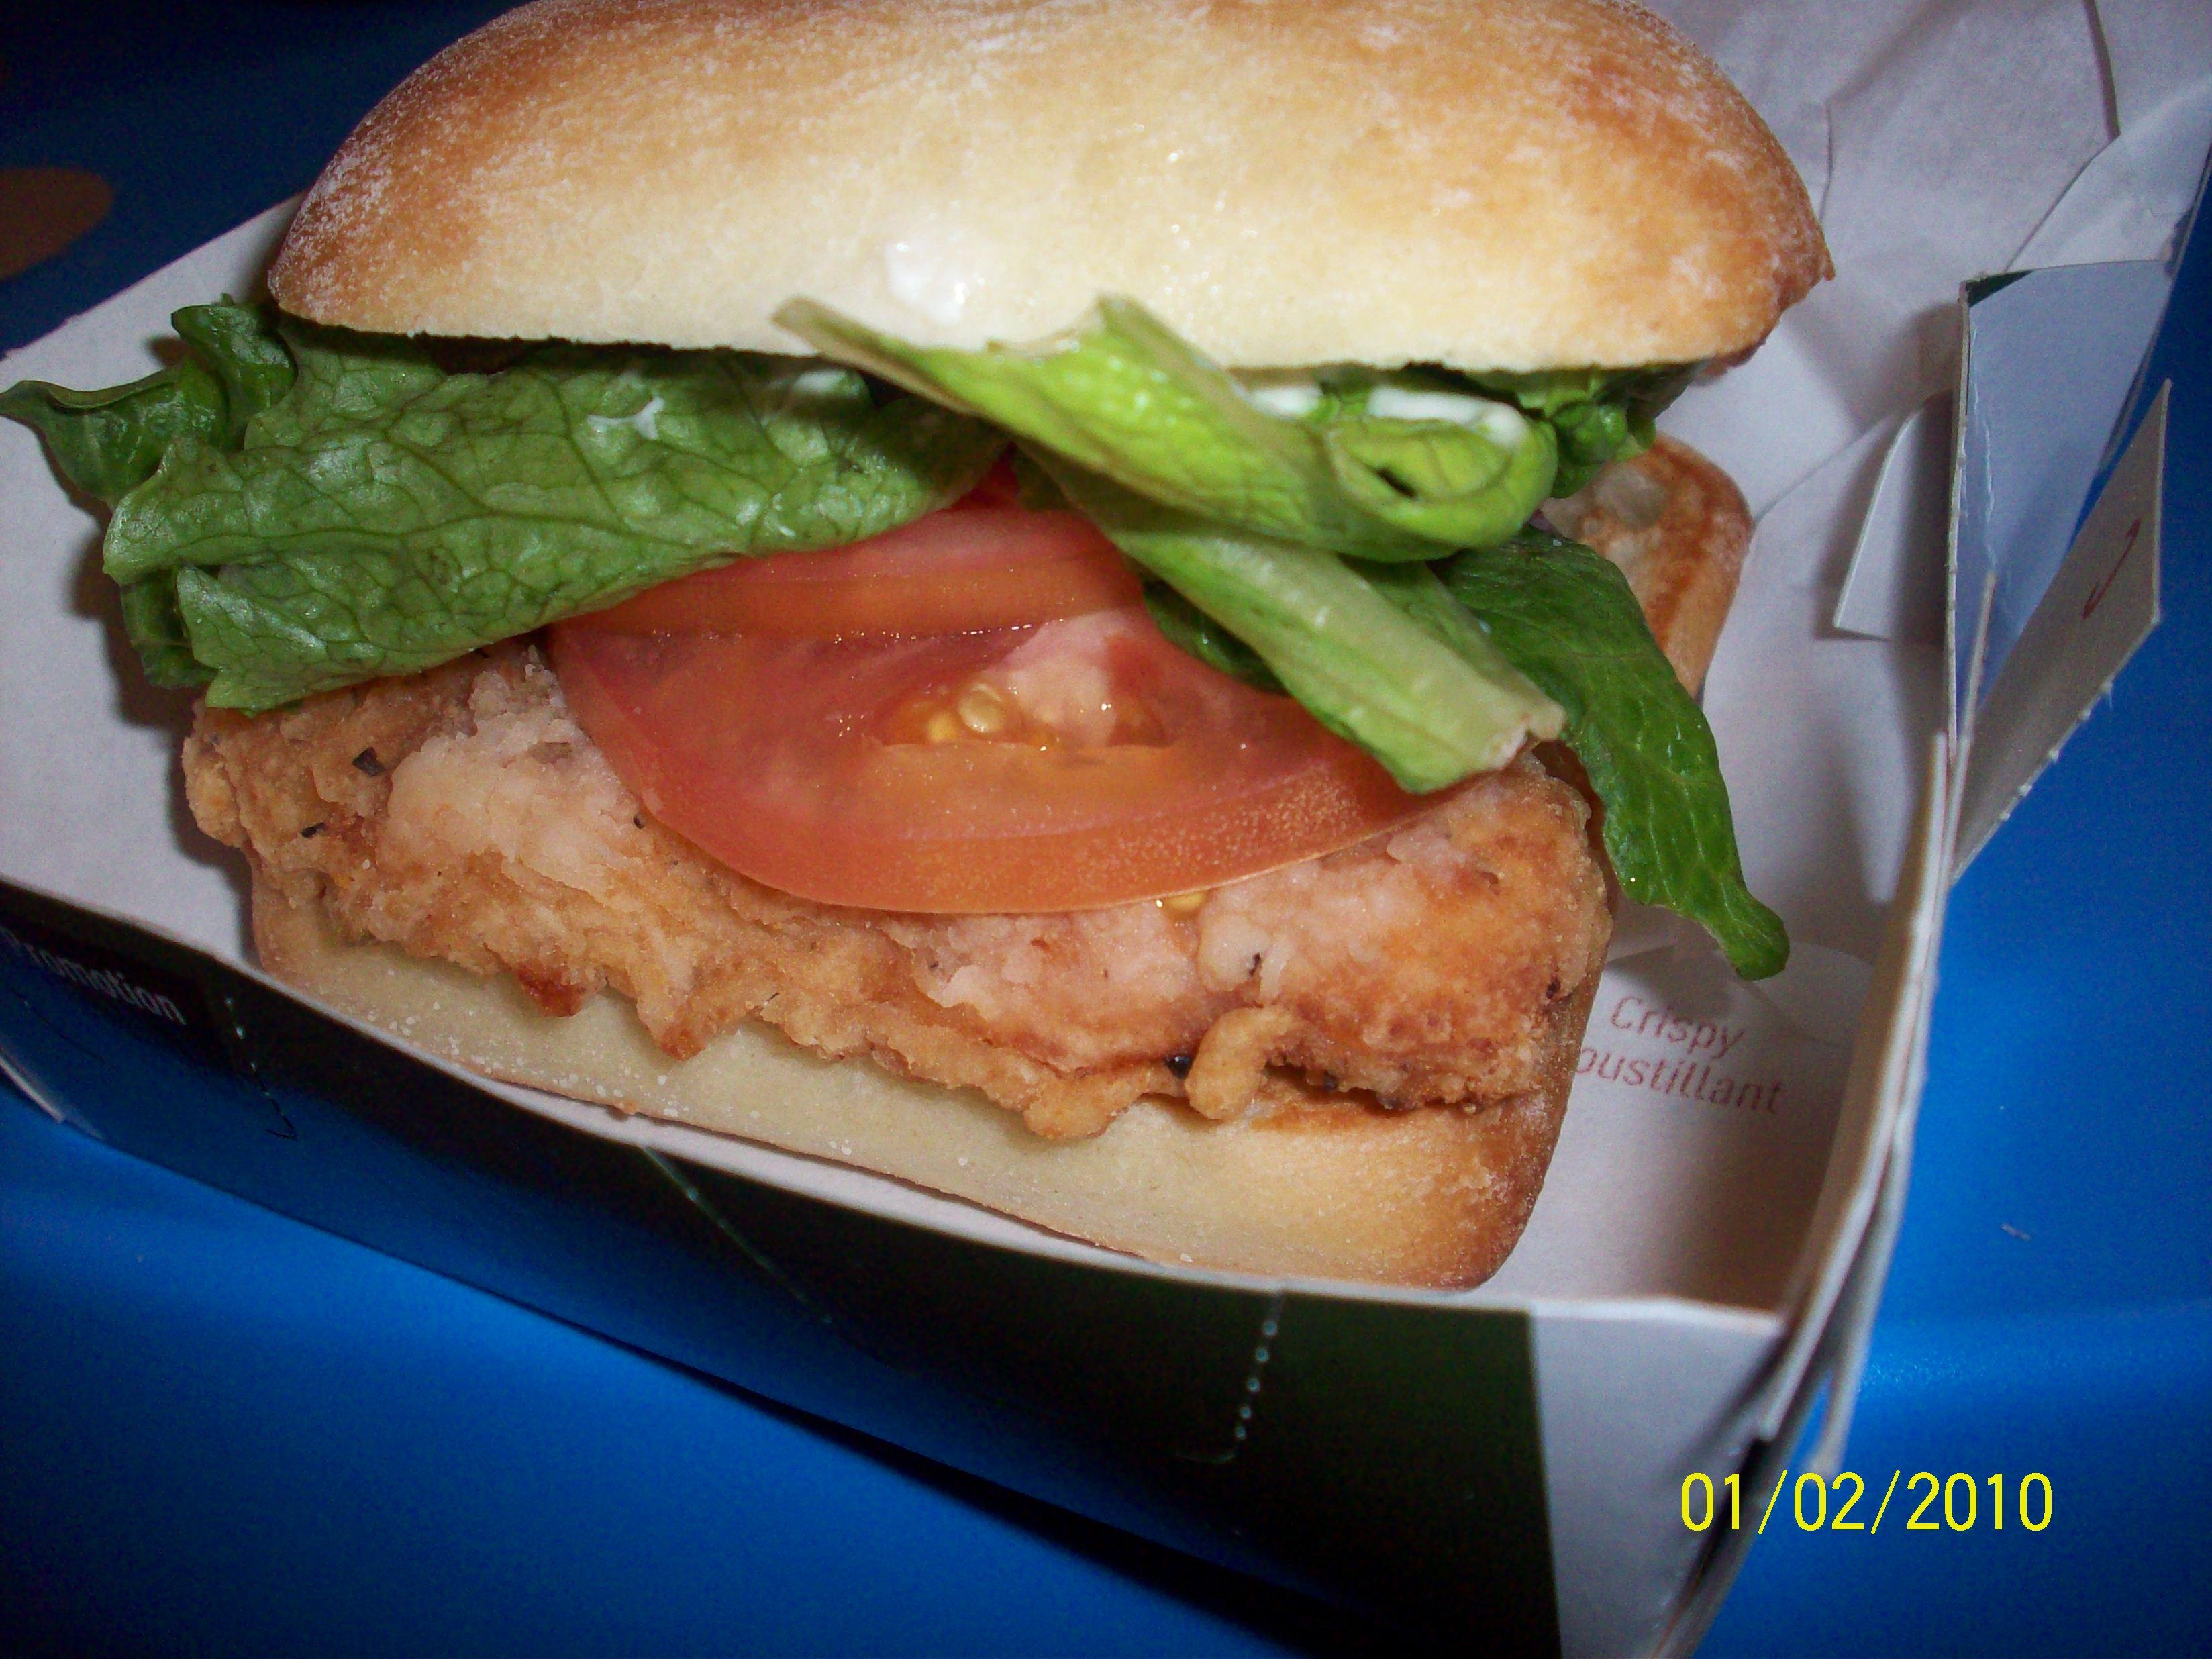 http://foodloader.net/cutie_2010-02-01_Crispy_McChicken.jpg